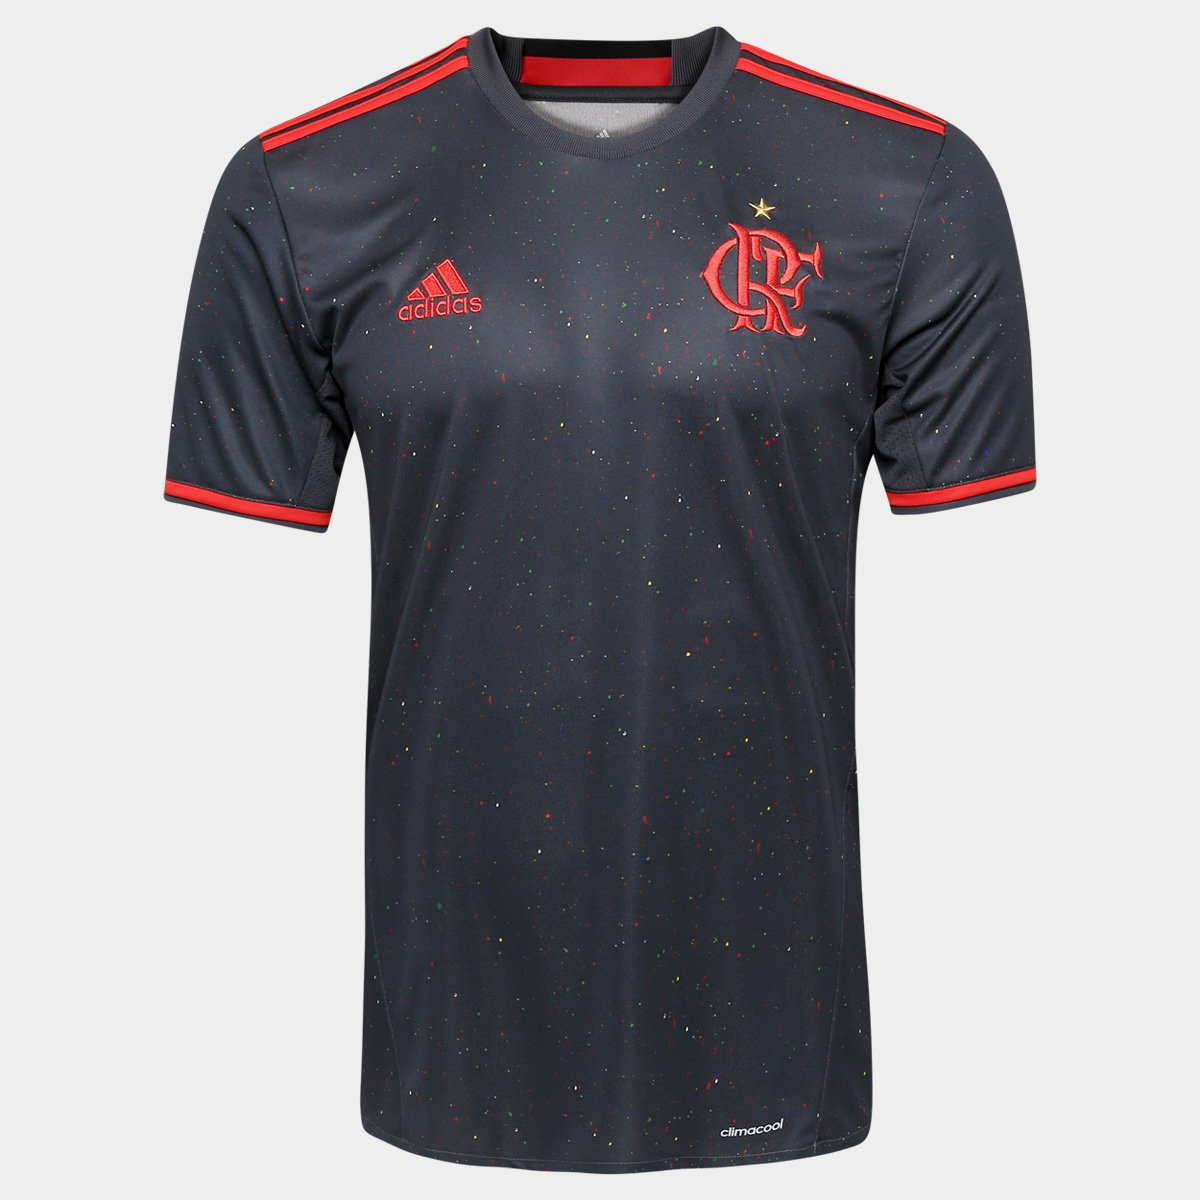 Camisa Flamengo Especial 2016 - Torcedor Adidas Masculina - Compre Agora  a03cf082213e3